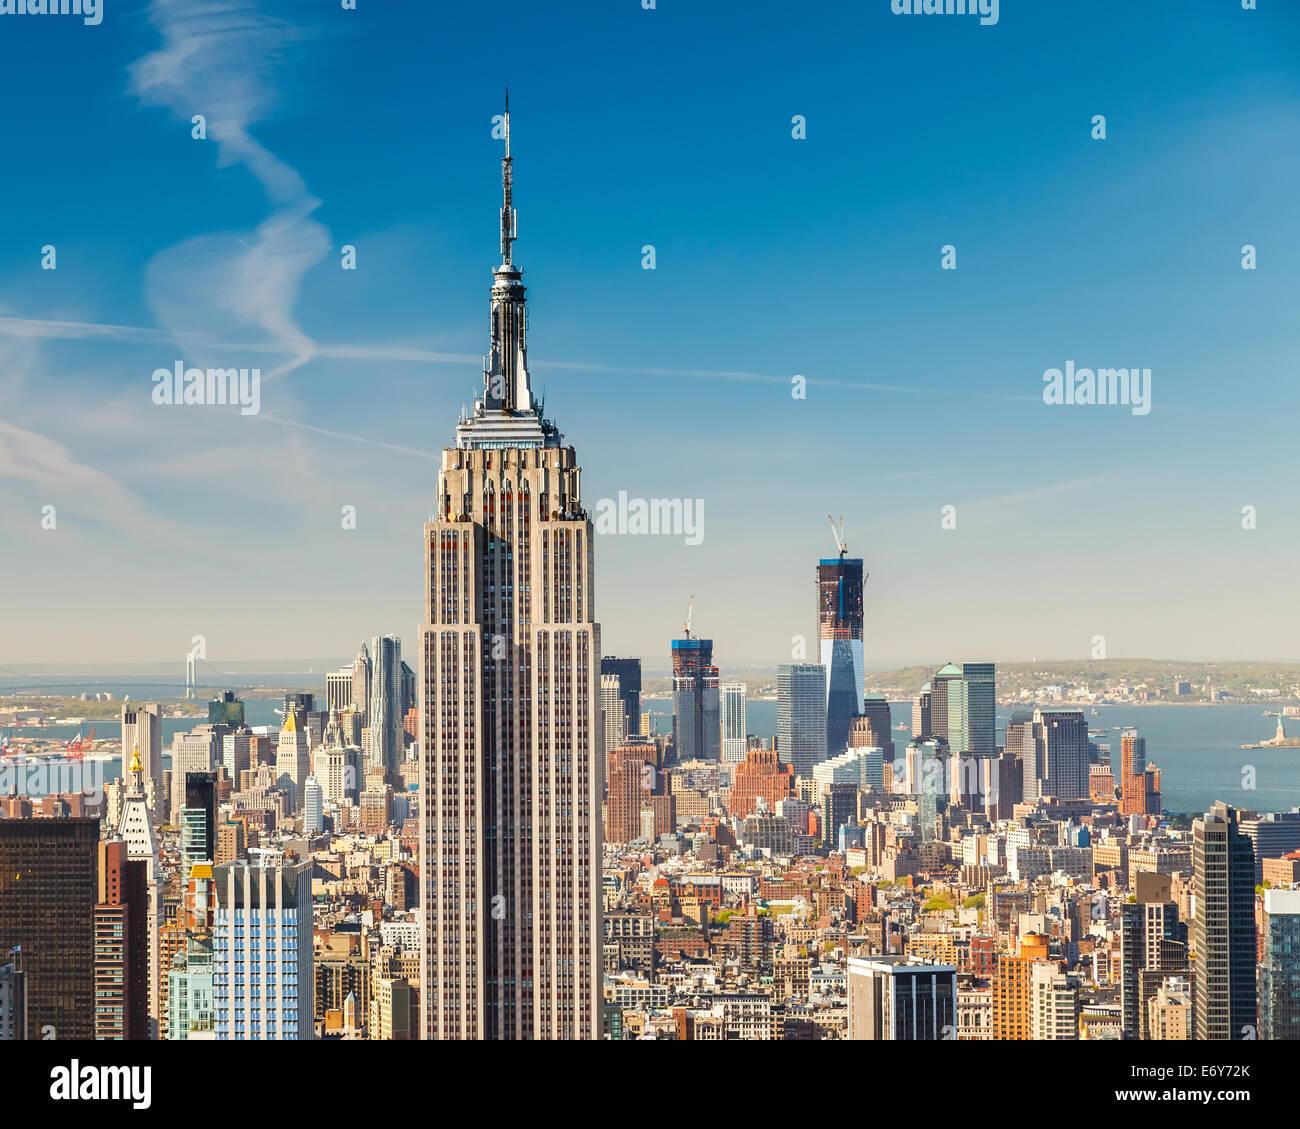 Vista aérea de Manhattan Imagen De Stock